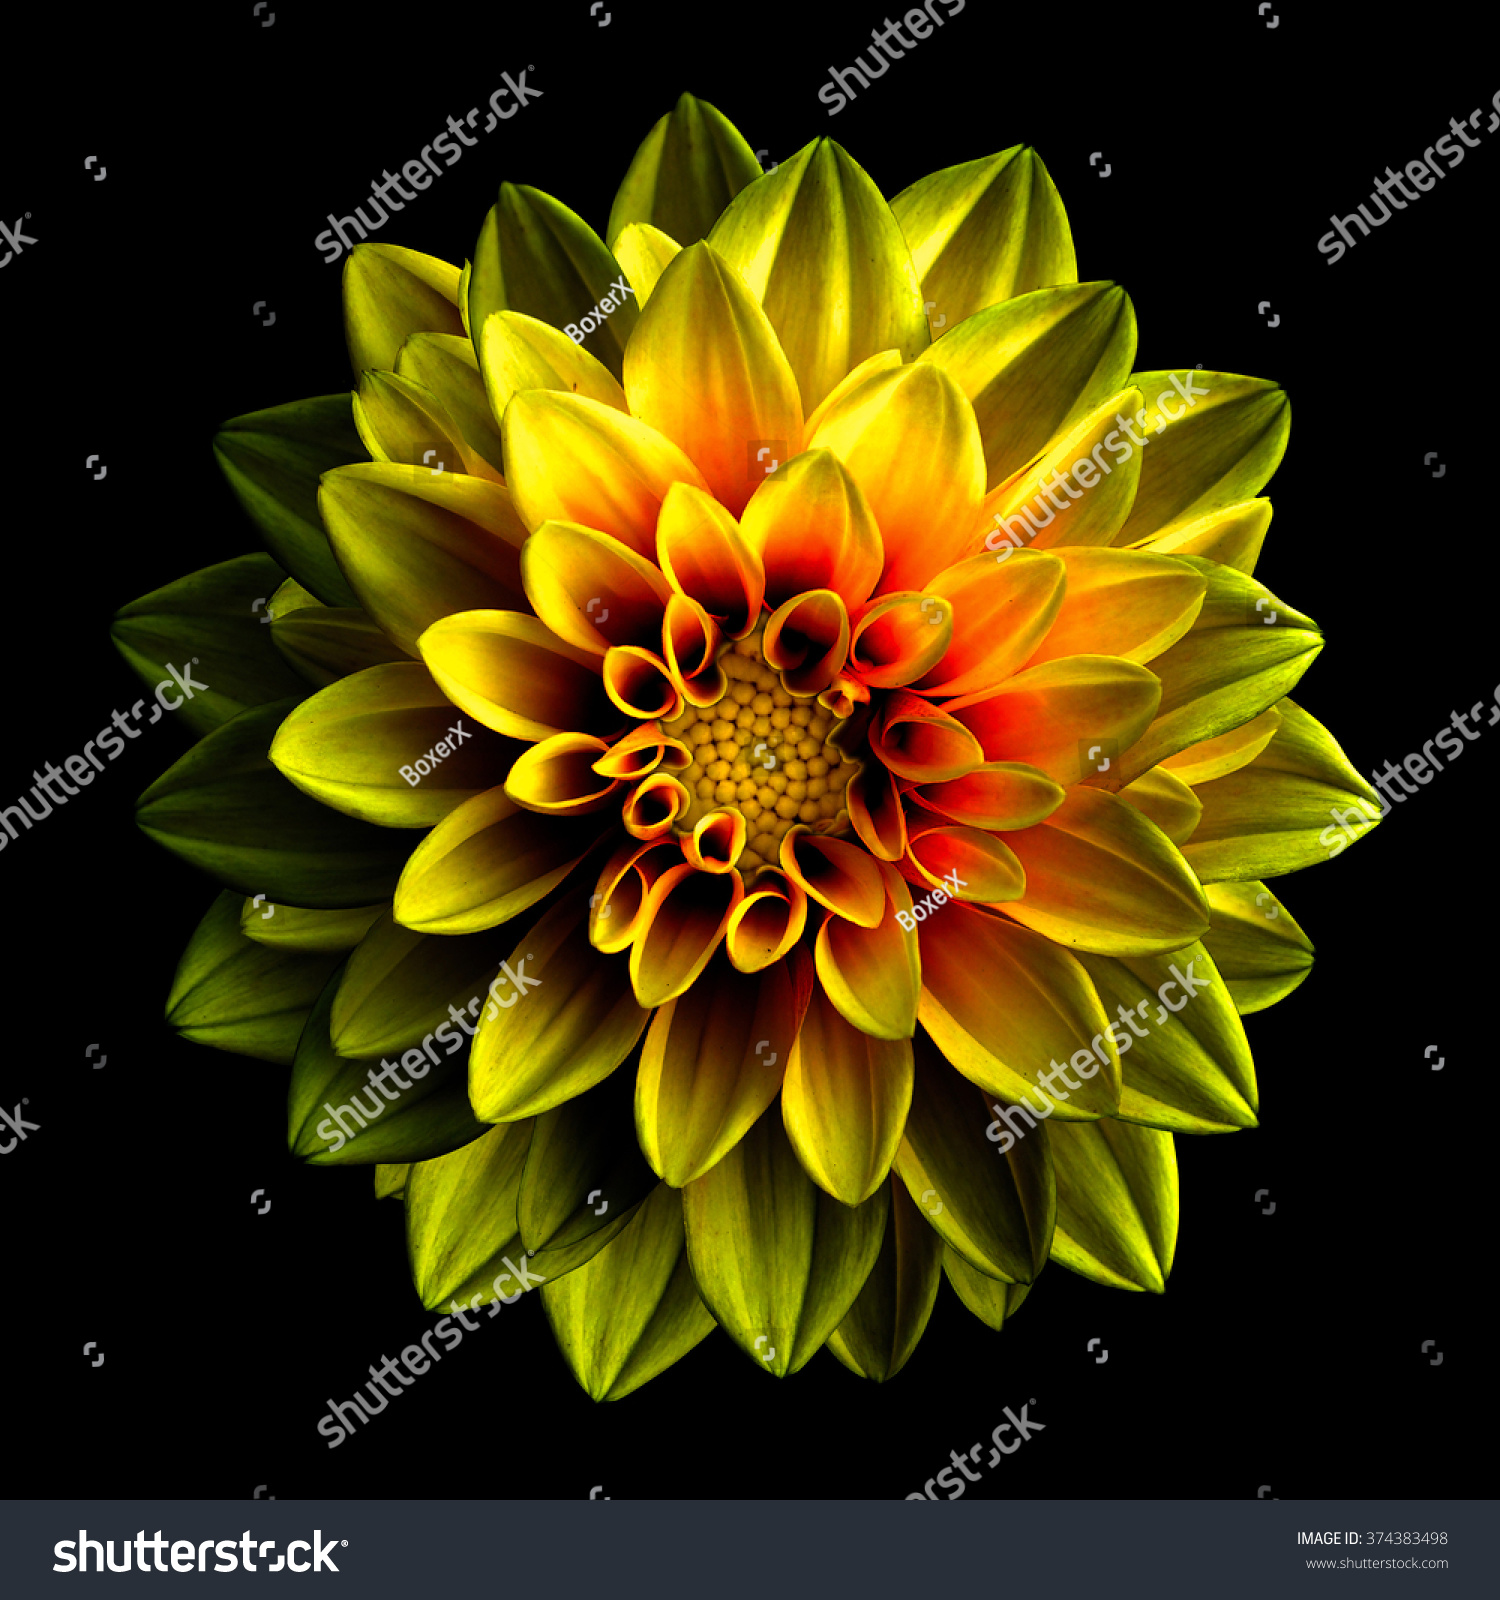 Surreal Dark Chrome Yellow Red Flower Stock Photo Edit Now